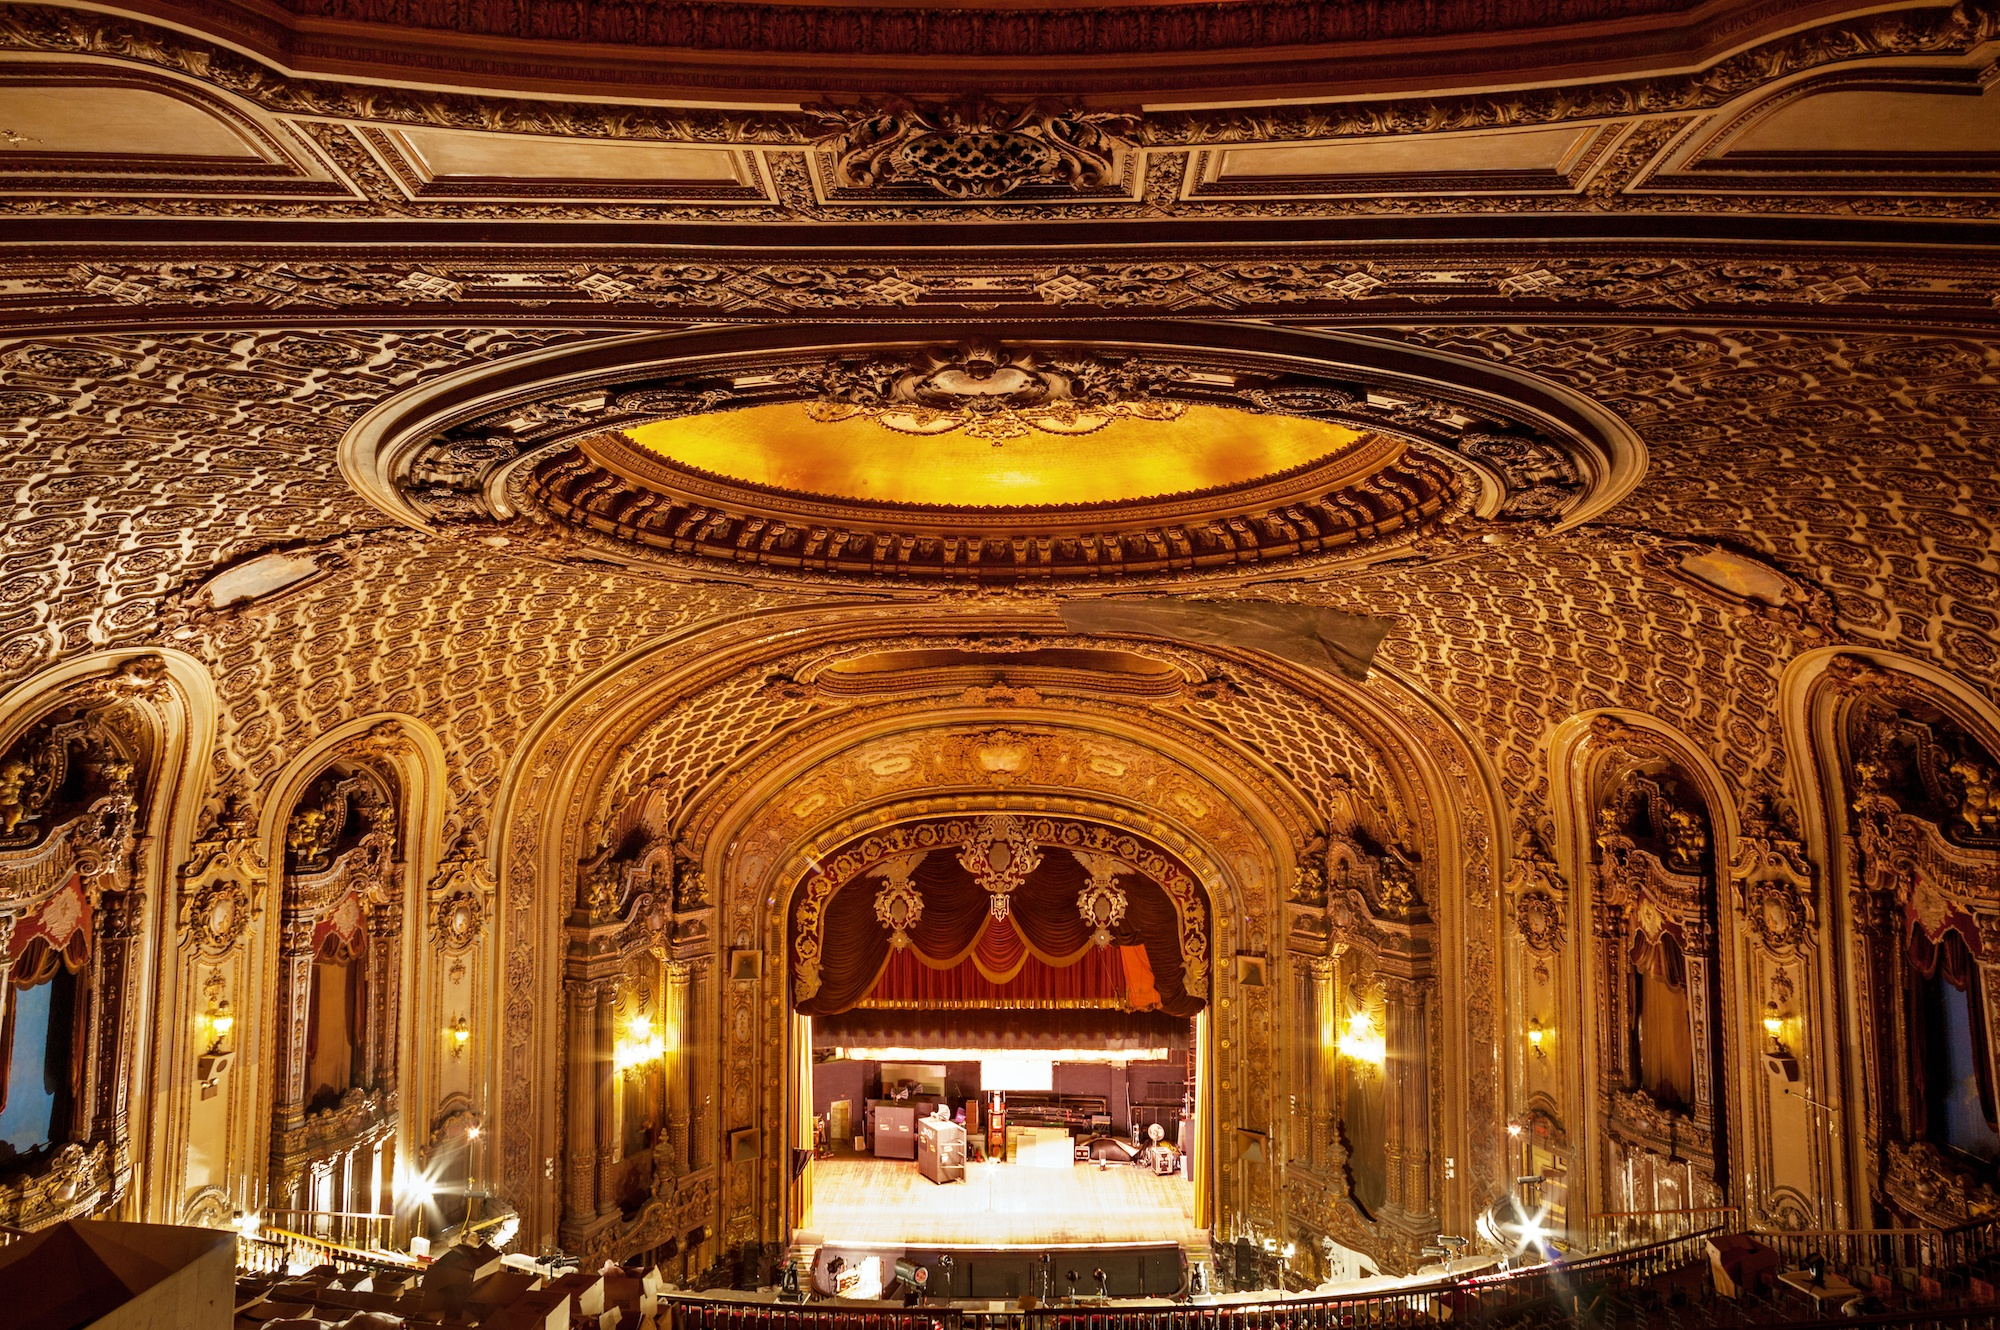 Loew's Jersey Theatre, Rapp and Rapp, Journal Square theater, Journal Square history, Loew's Jersey City, Loew's Wonder Theatres, Wonder Theatre Jersey City, Jersey City historic theater